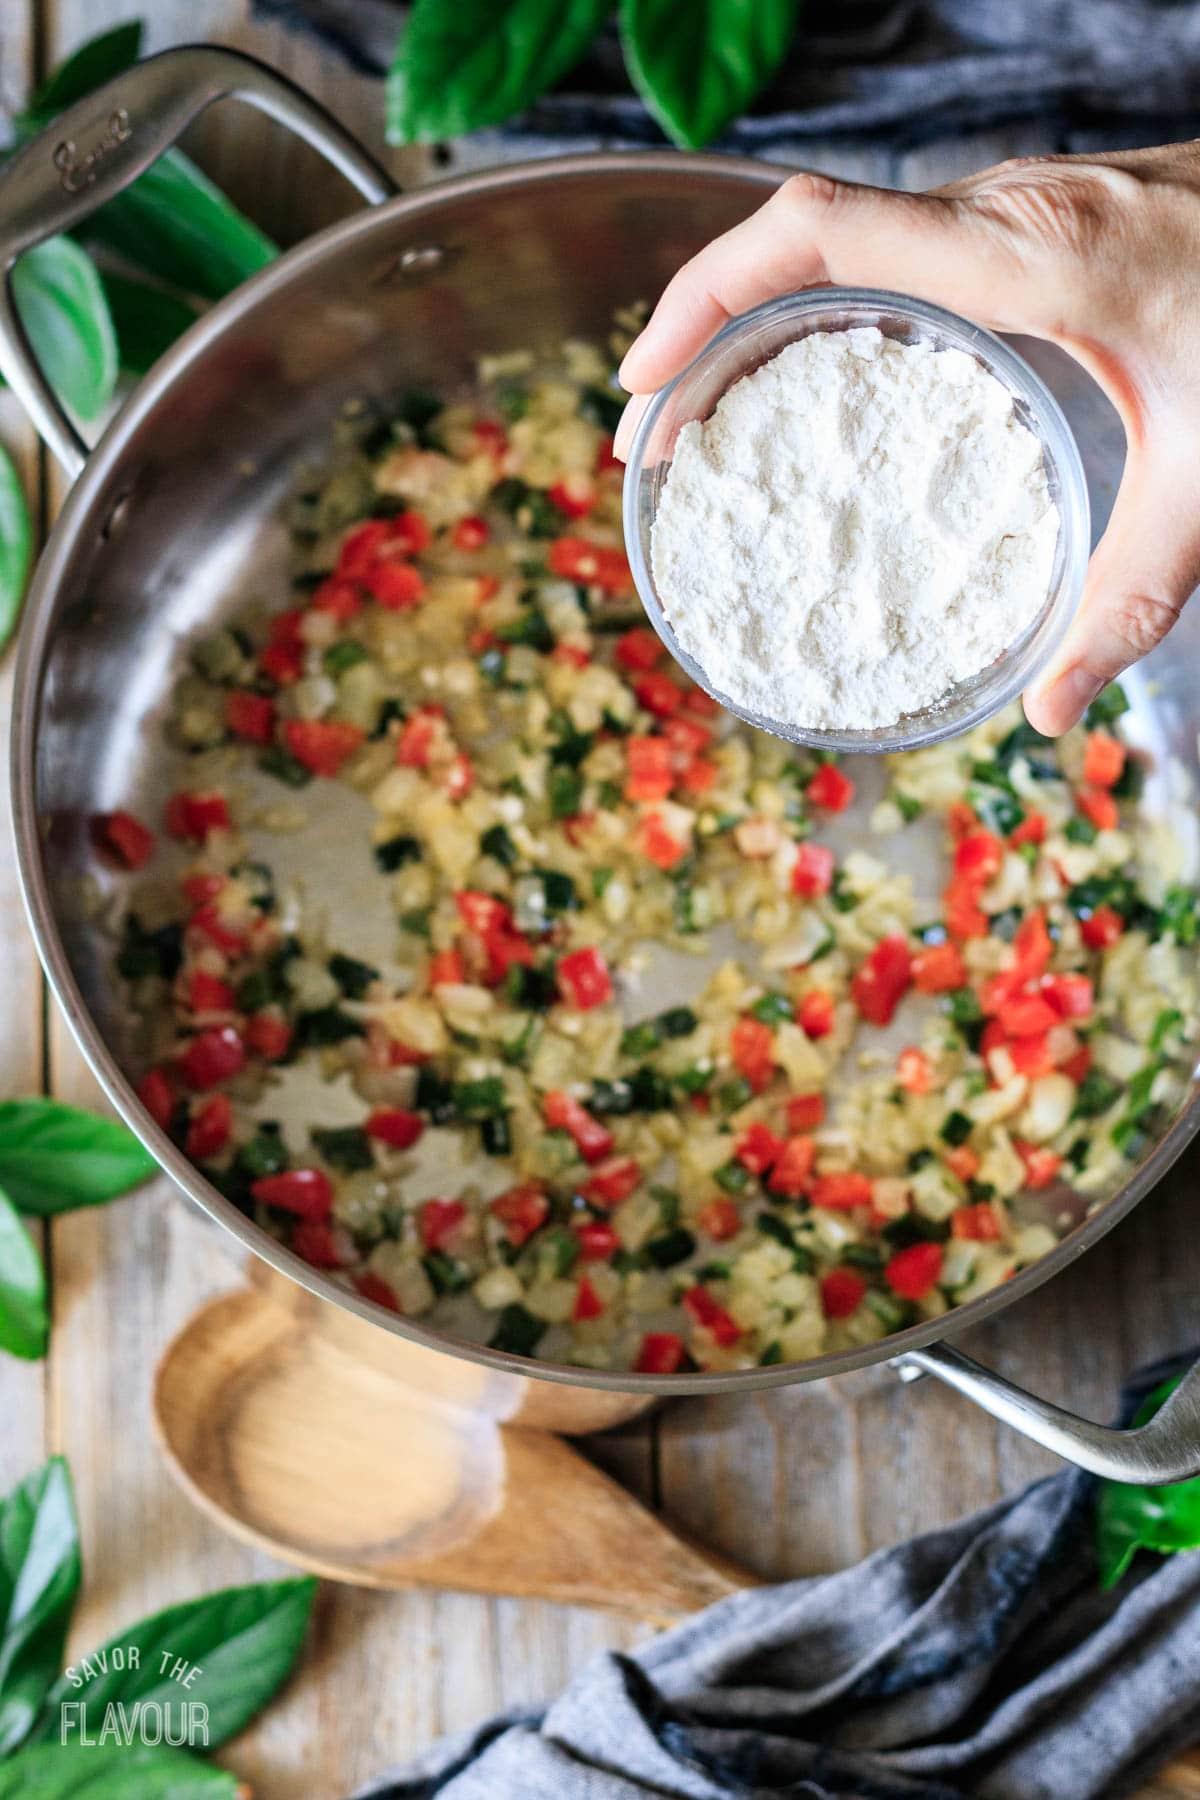 person pouring flour into the pot of sauteed veggies